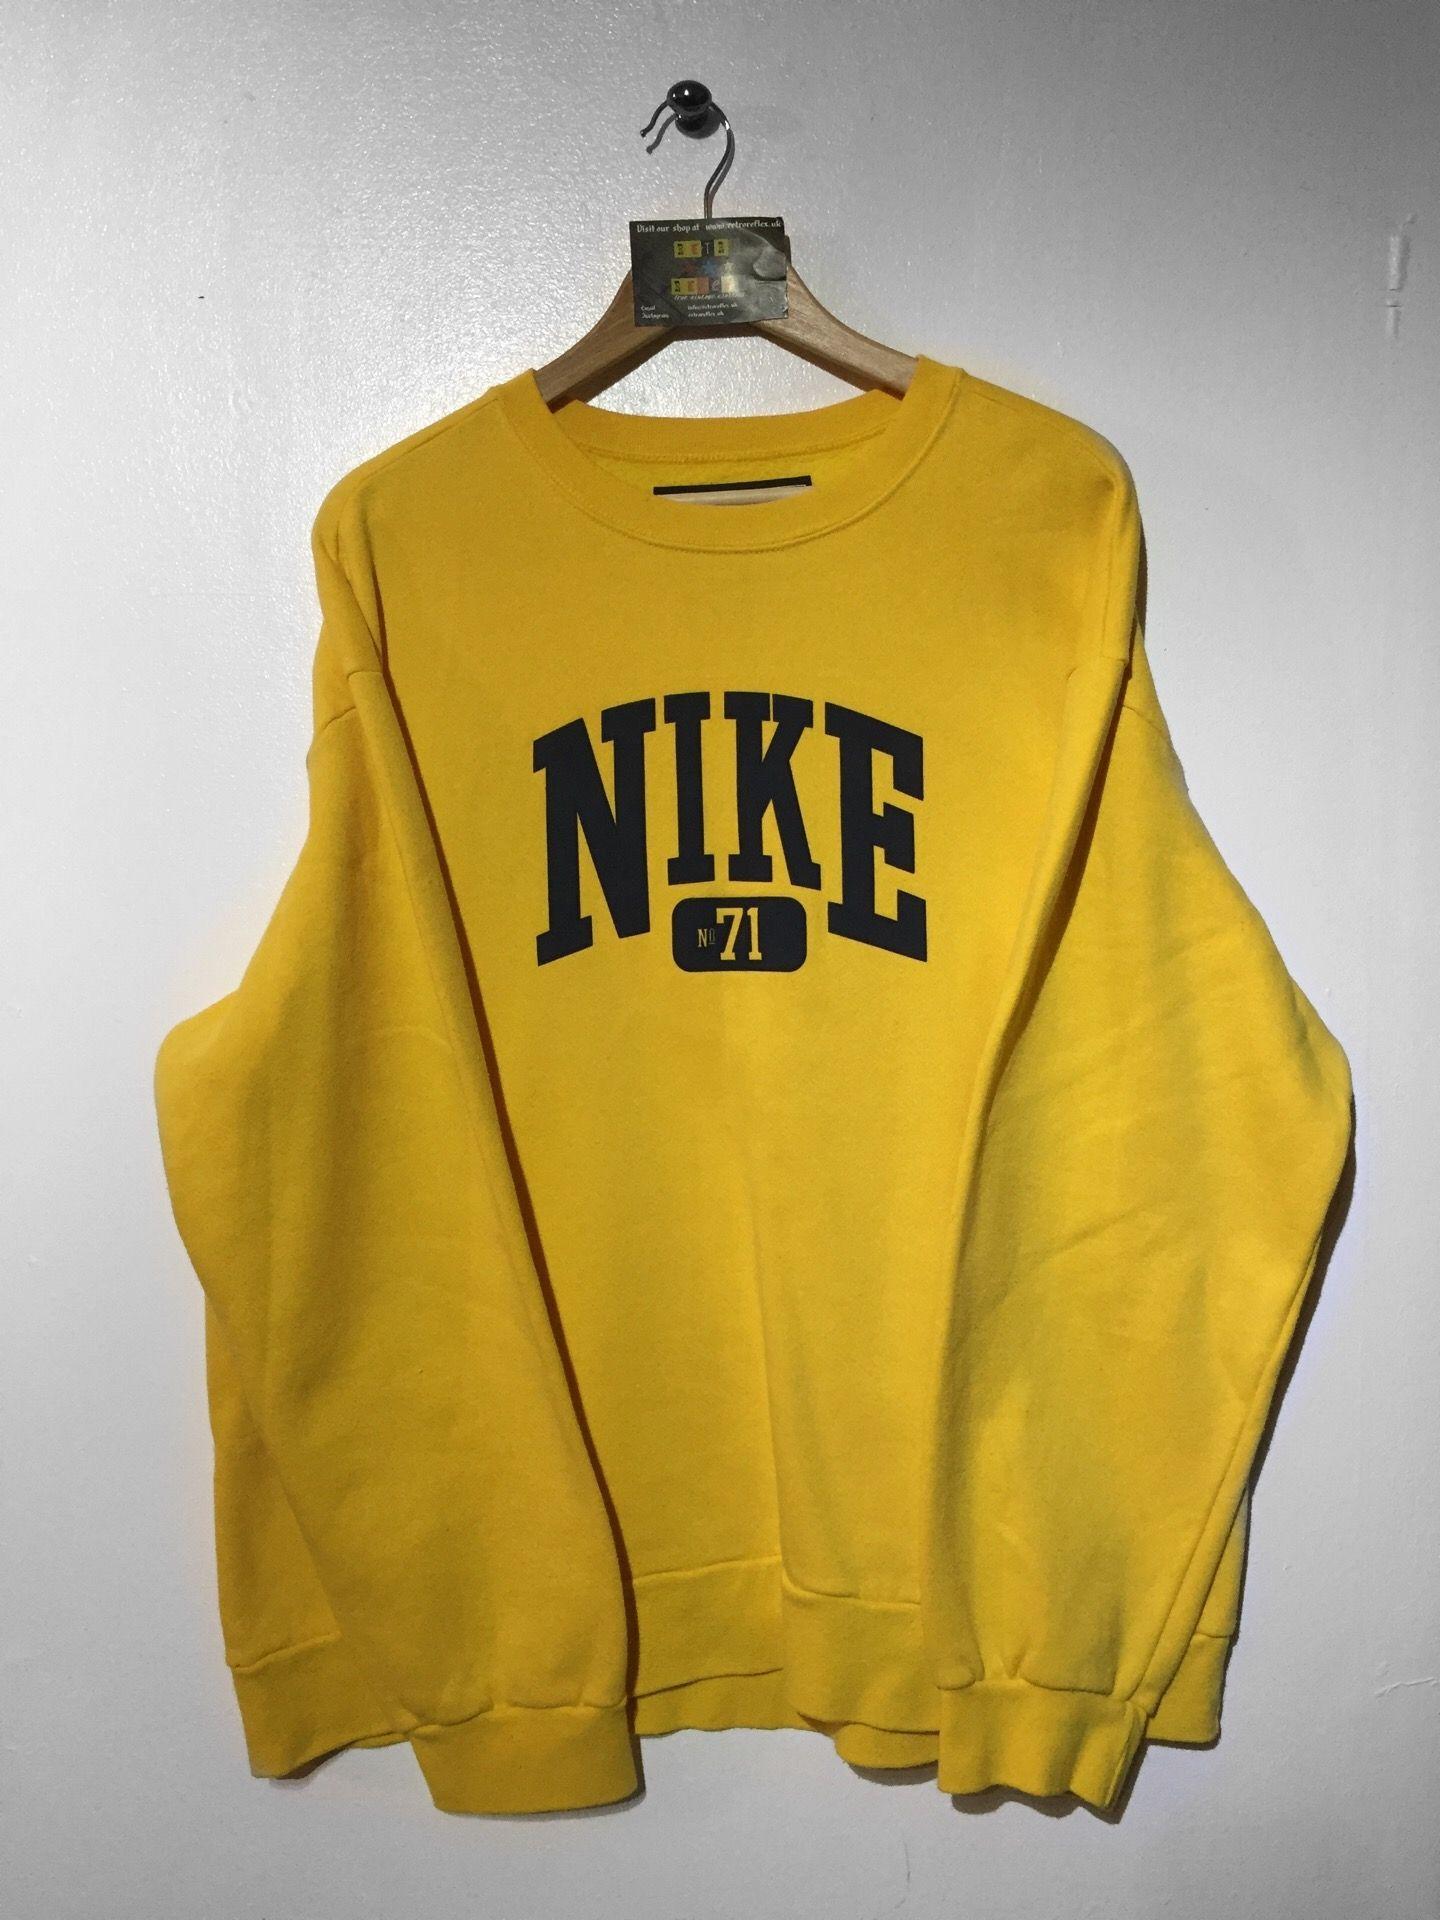 Nike Sweatshirt Size Large But Fits Oversized 34 Website Www Retroreflex Uk Nike Vintage Vintagefashion Oldschool Retro Ropa Ropa Vintage Ropa Tumblr [ 1920 x 1440 Pixel ]